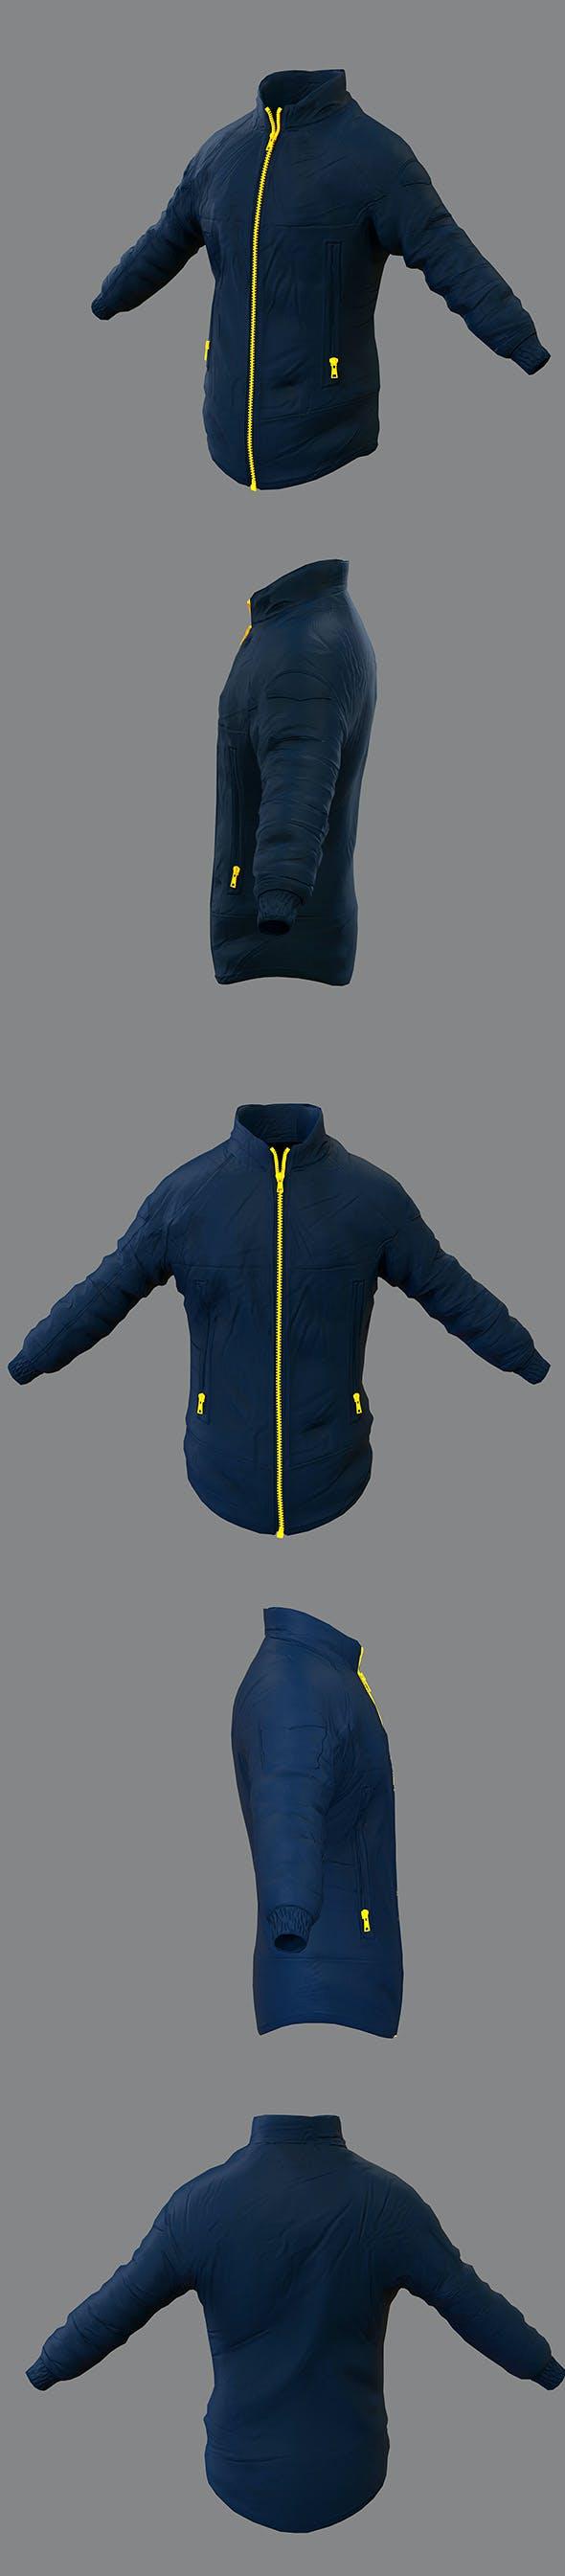 Hiking Jacket - 3DOcean Item for Sale